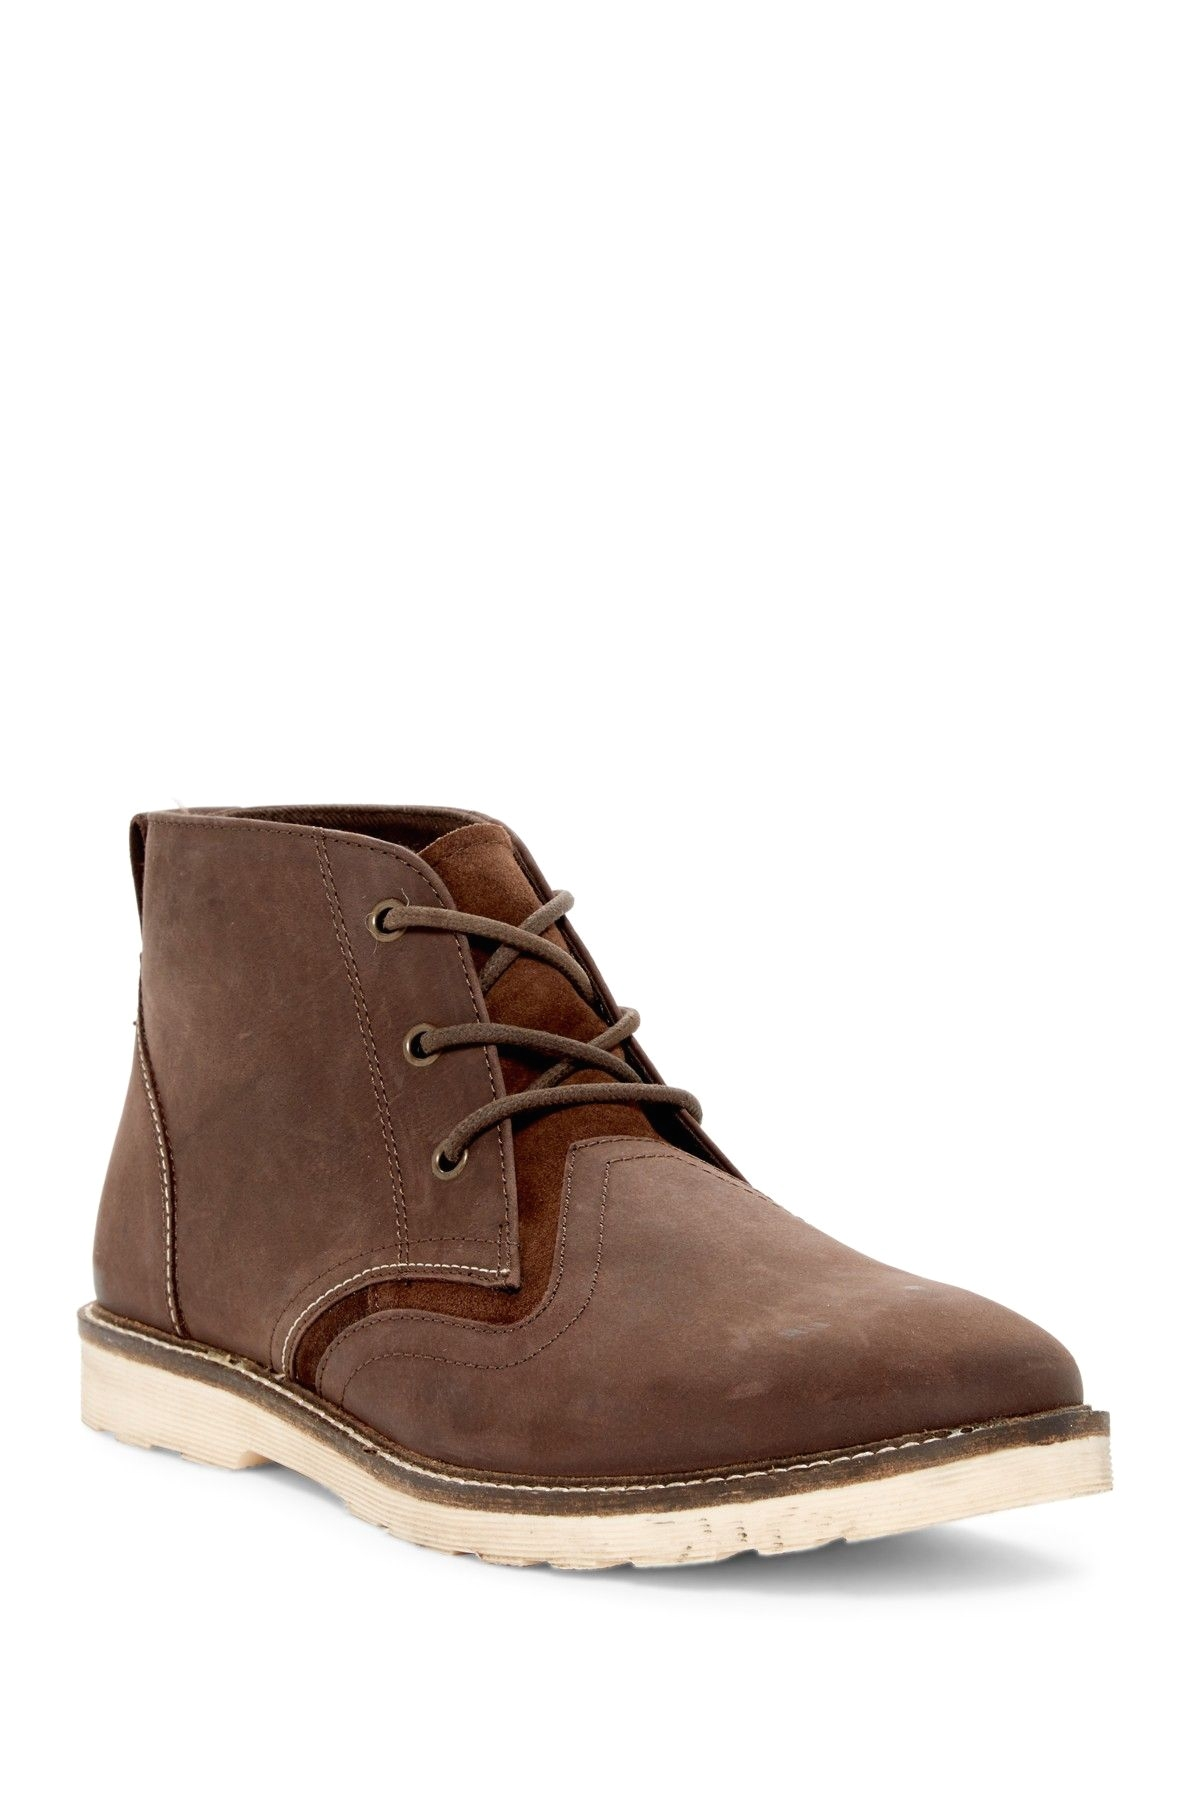 cray chukka boot